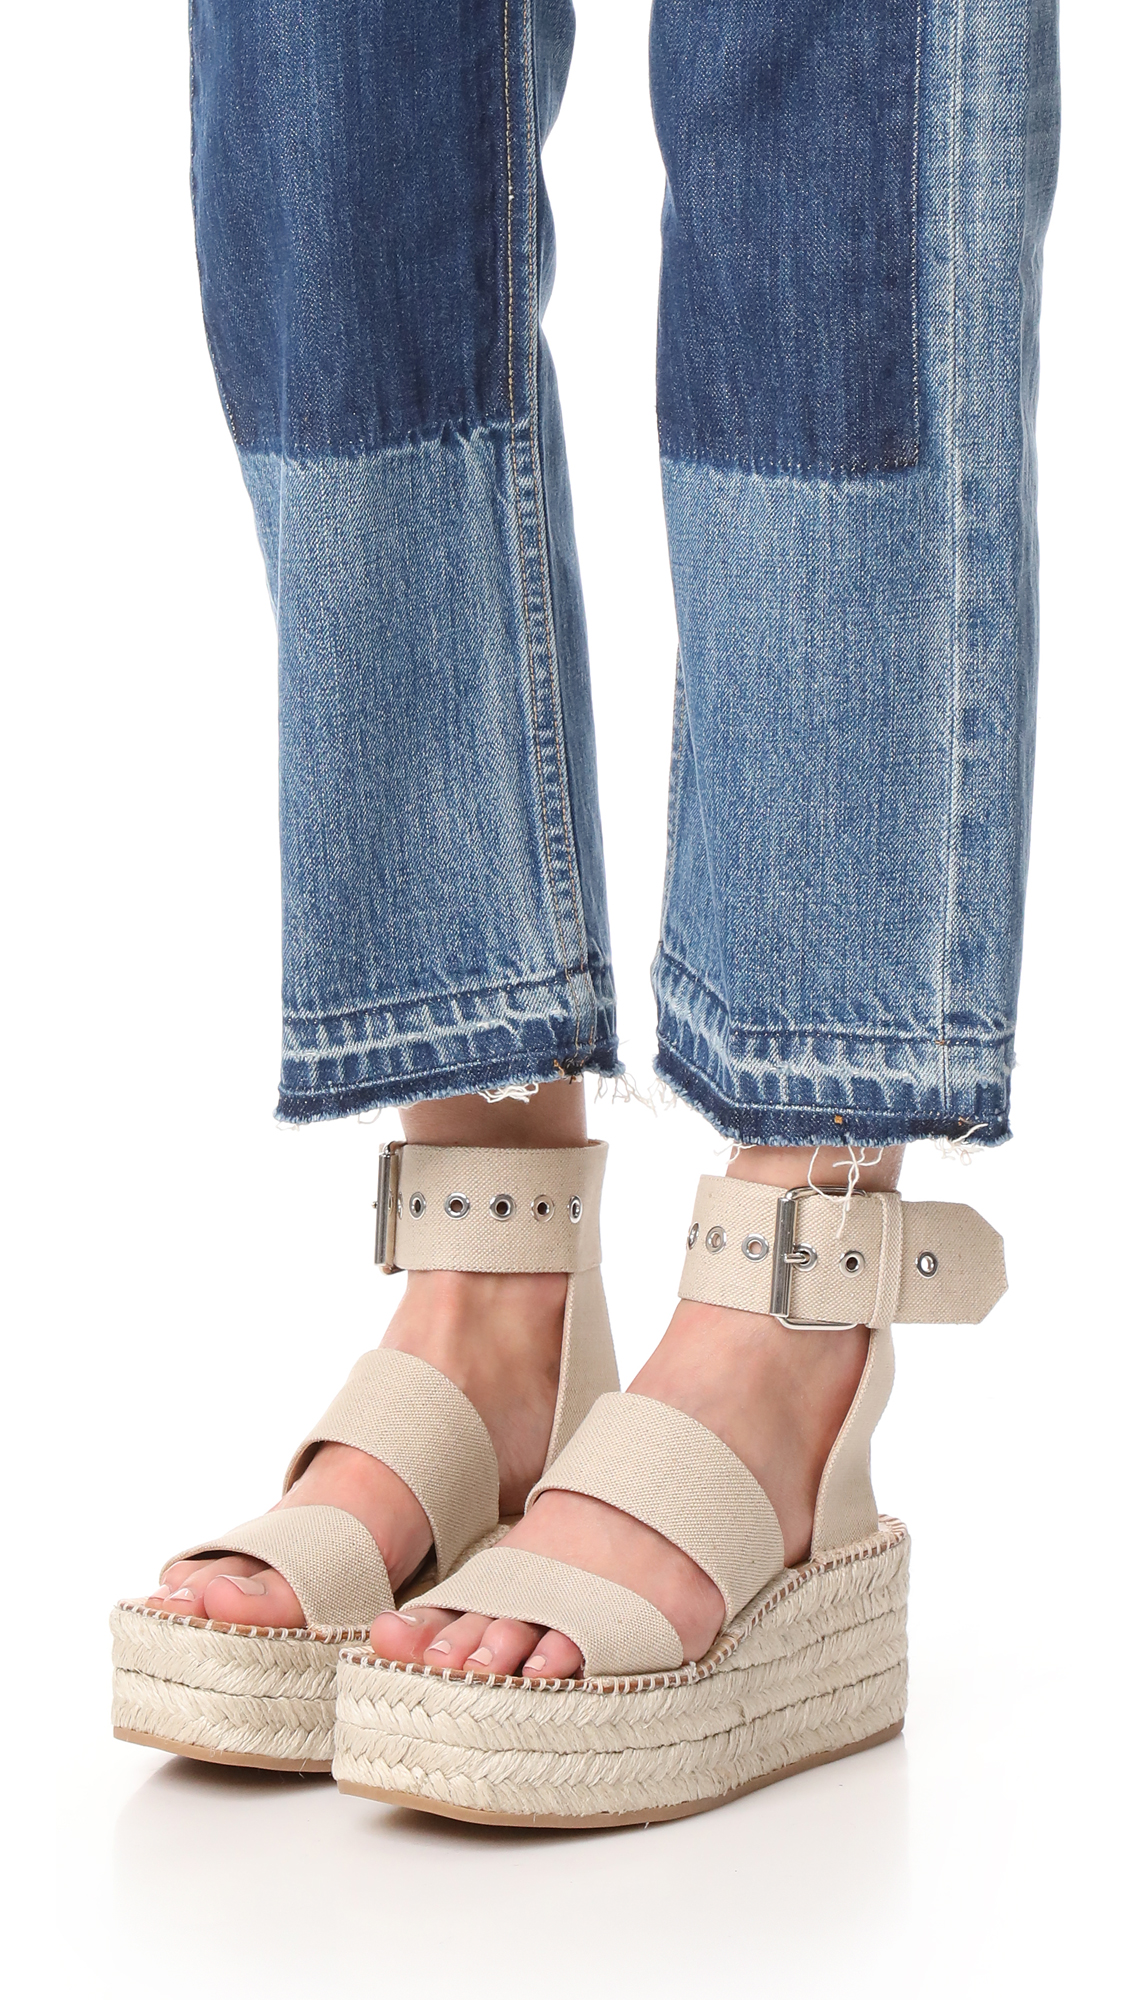 76183c0aad47 Rag   Bone Tara Platform Sandals